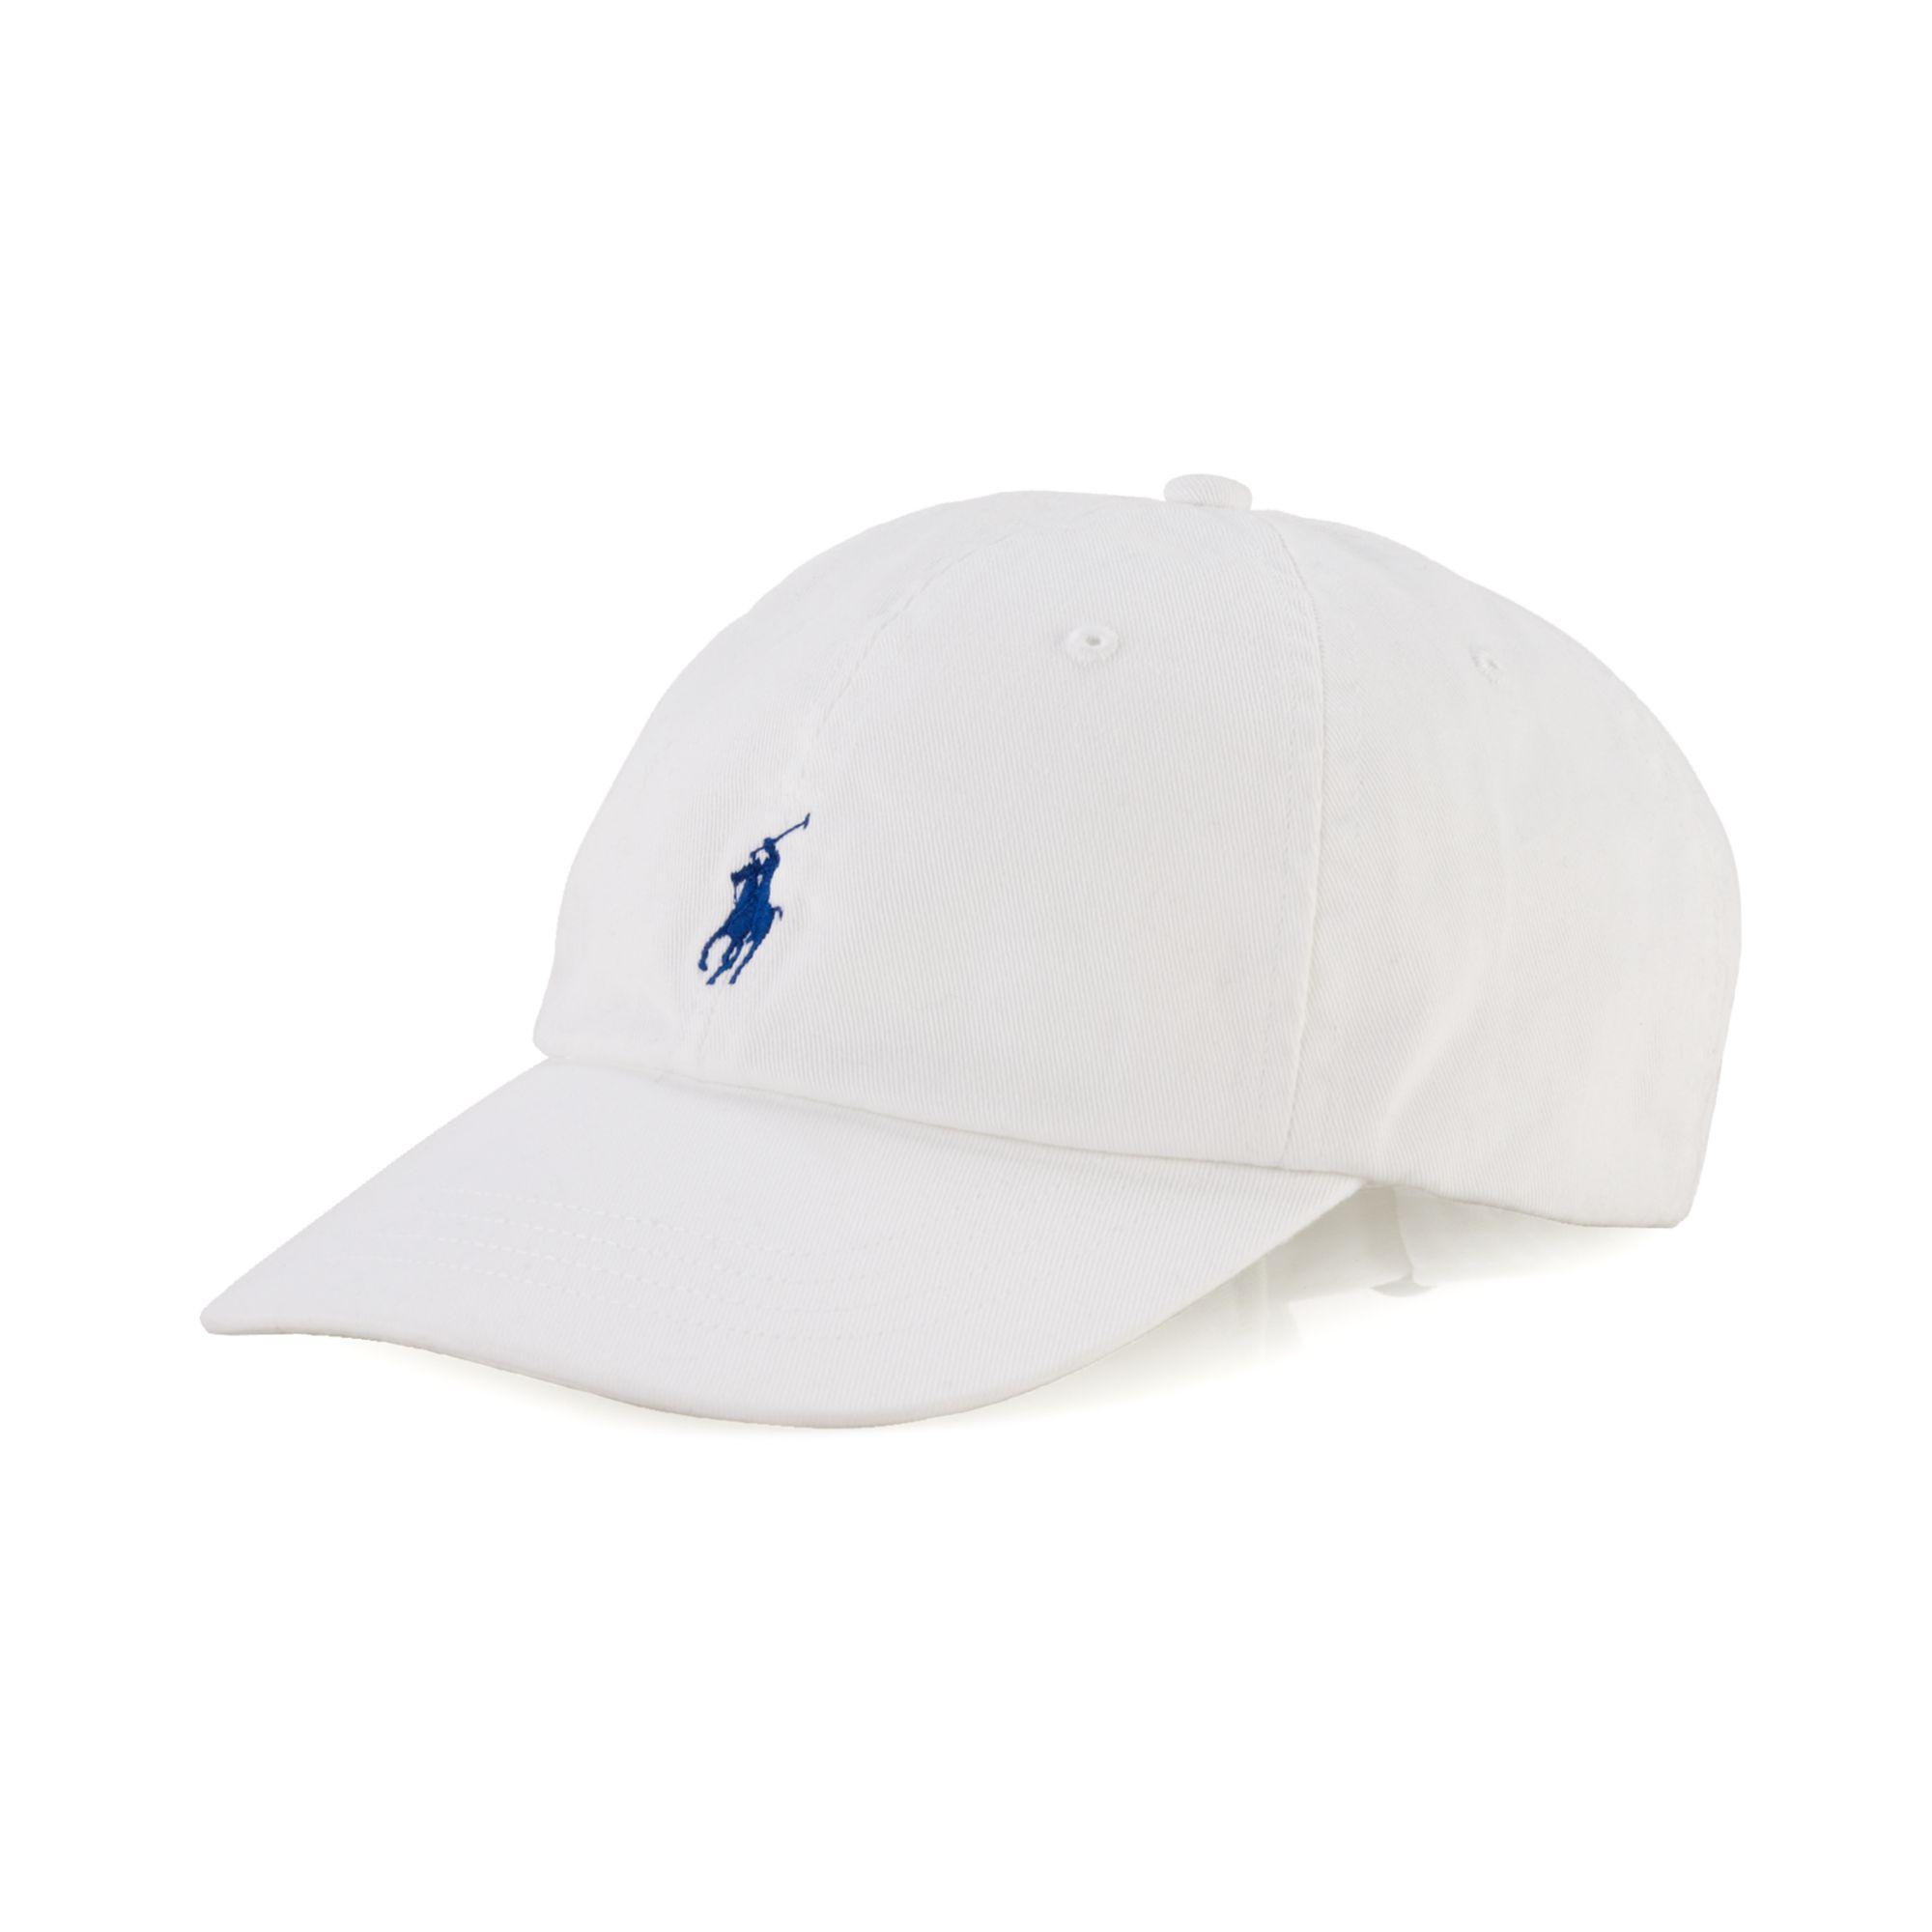 polo ralph lauren core classic sport cap in white for men. Black Bedroom Furniture Sets. Home Design Ideas